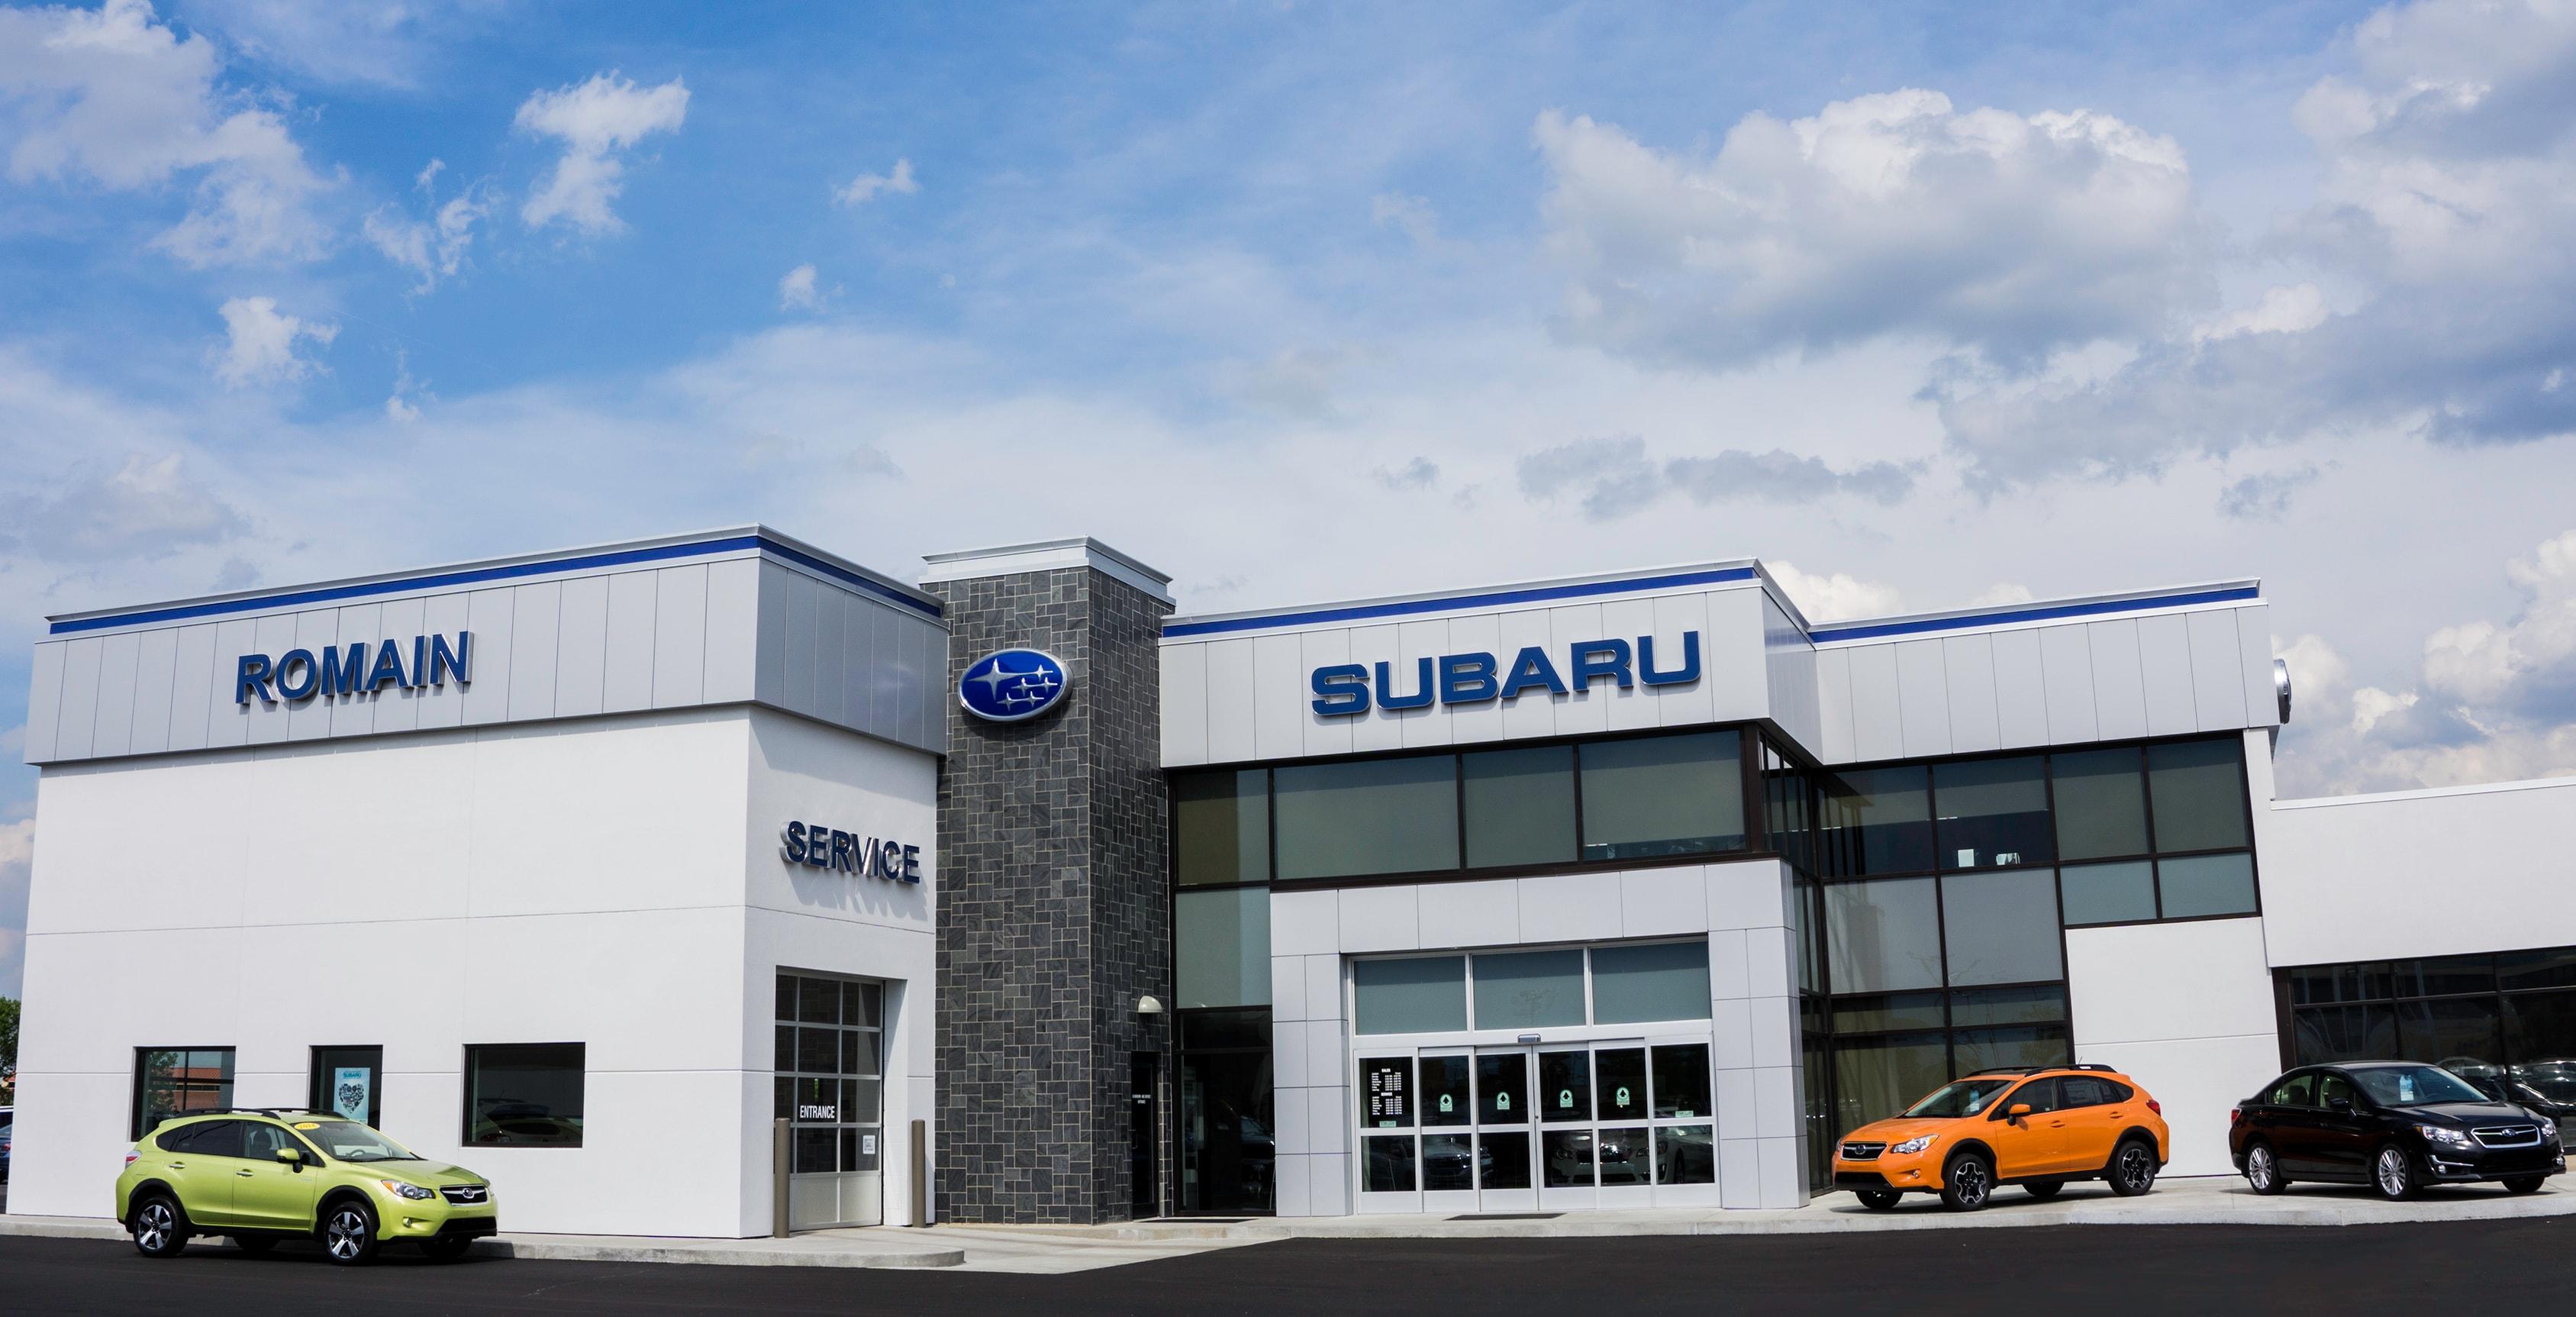 About Romain Subaru New Subaru Used Cars In Evansville